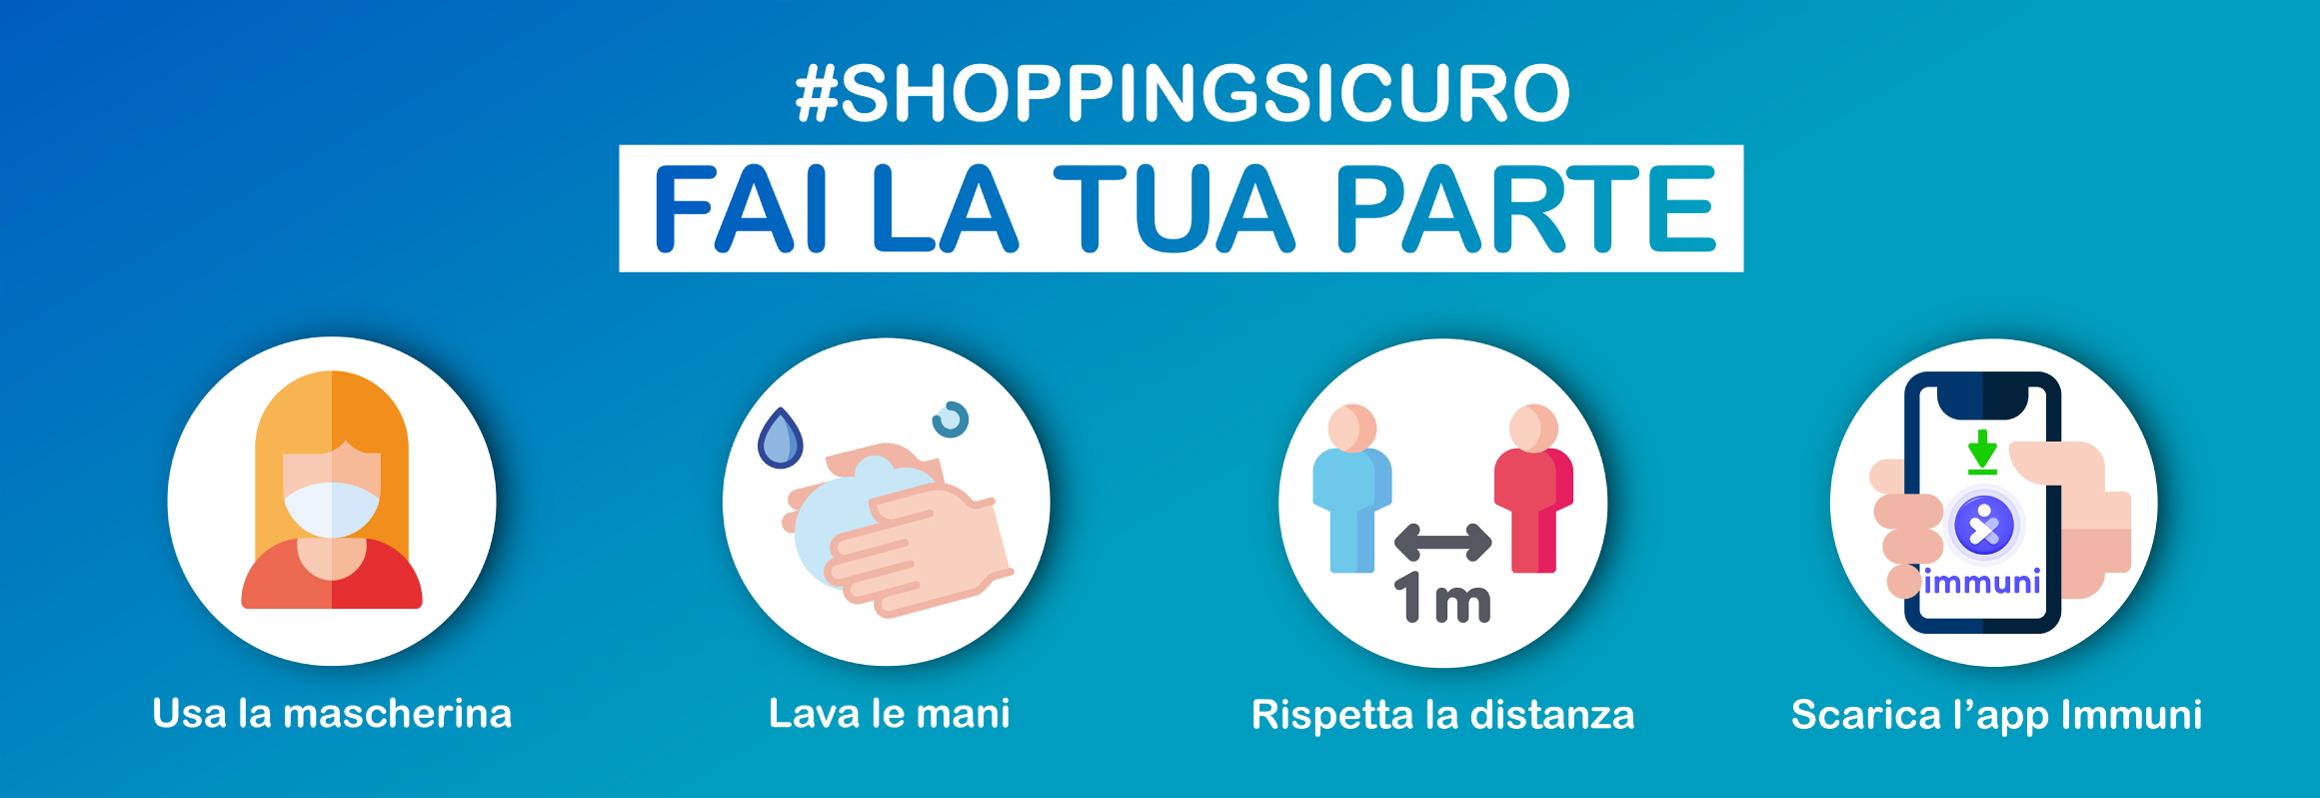 Shopping sicuro